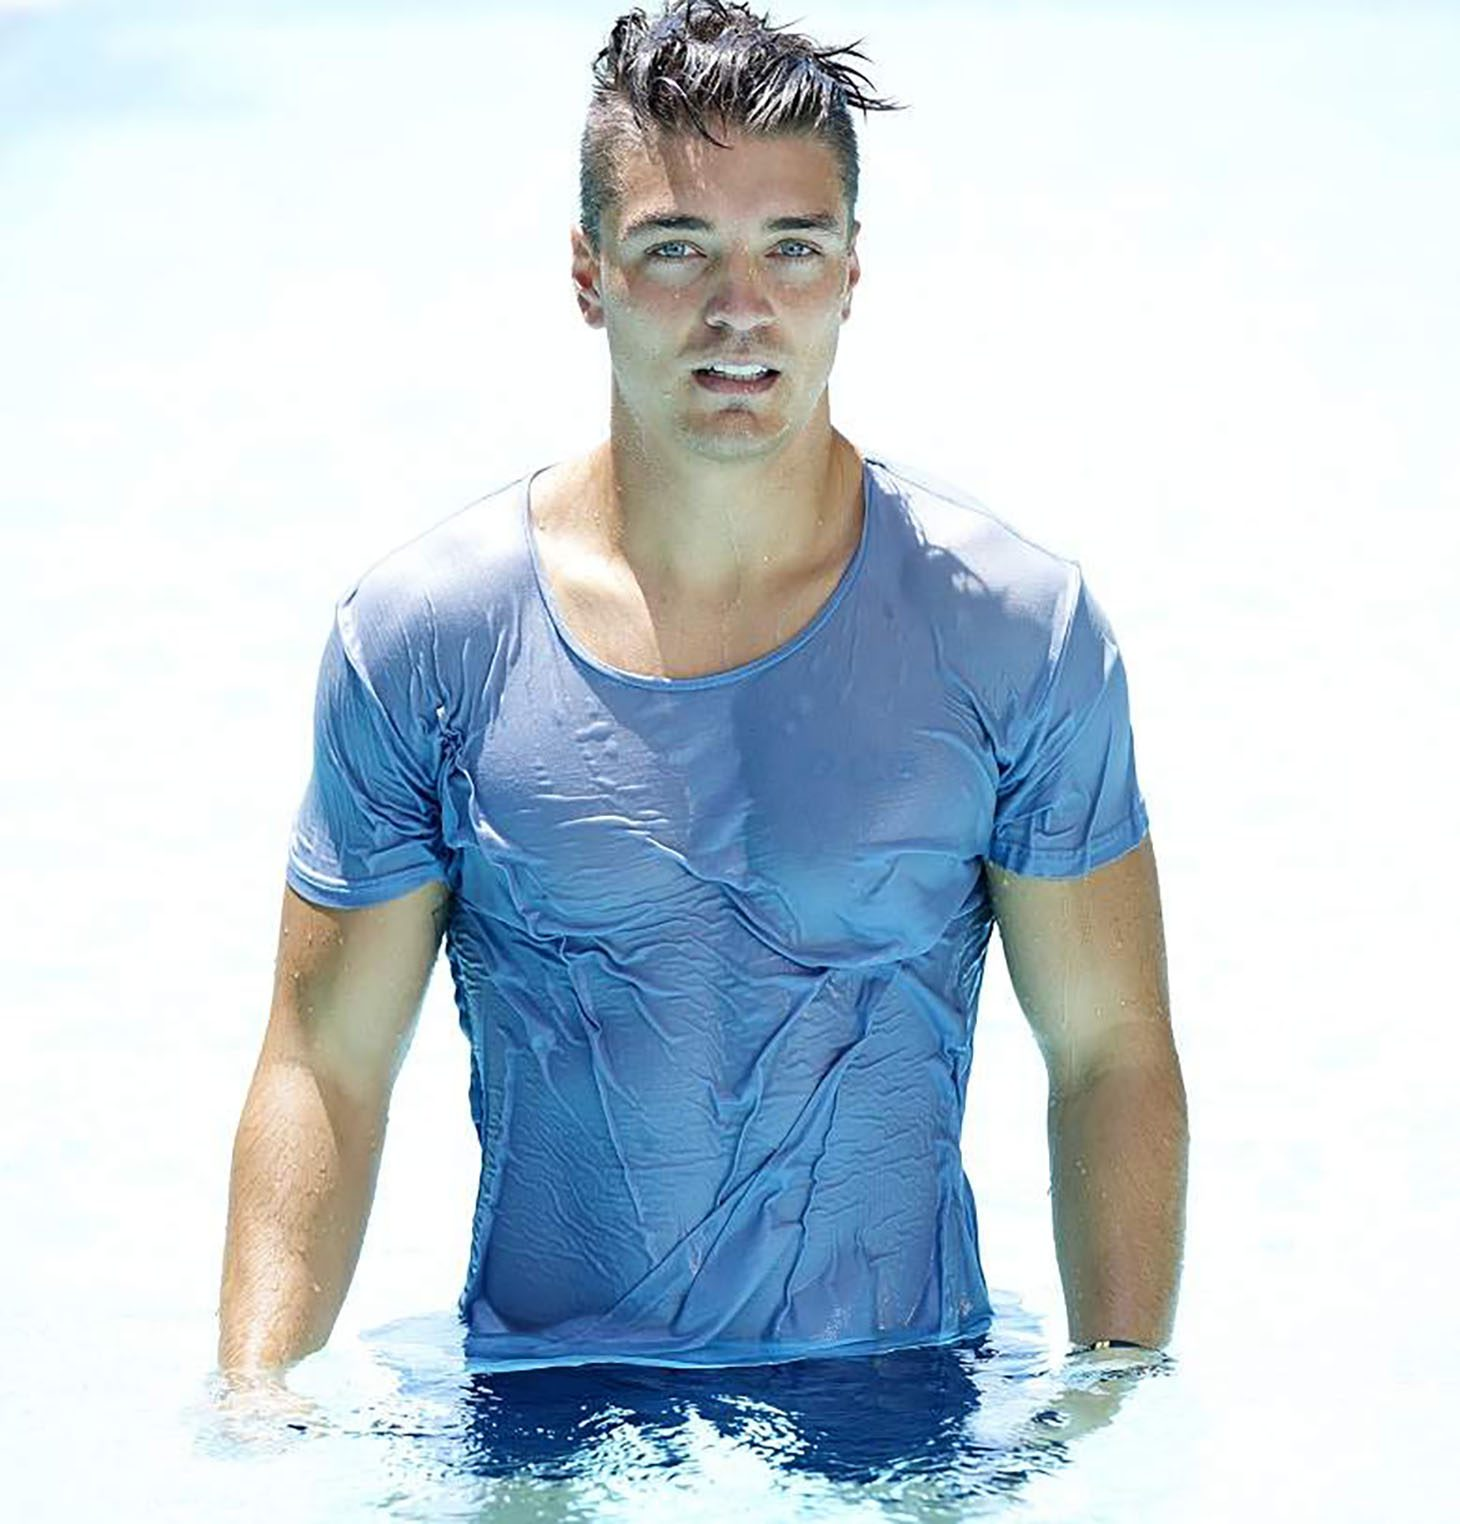 fb862c5a9d My Bachelor In Paradise Secret | Jillian Harris | Bloglovin'